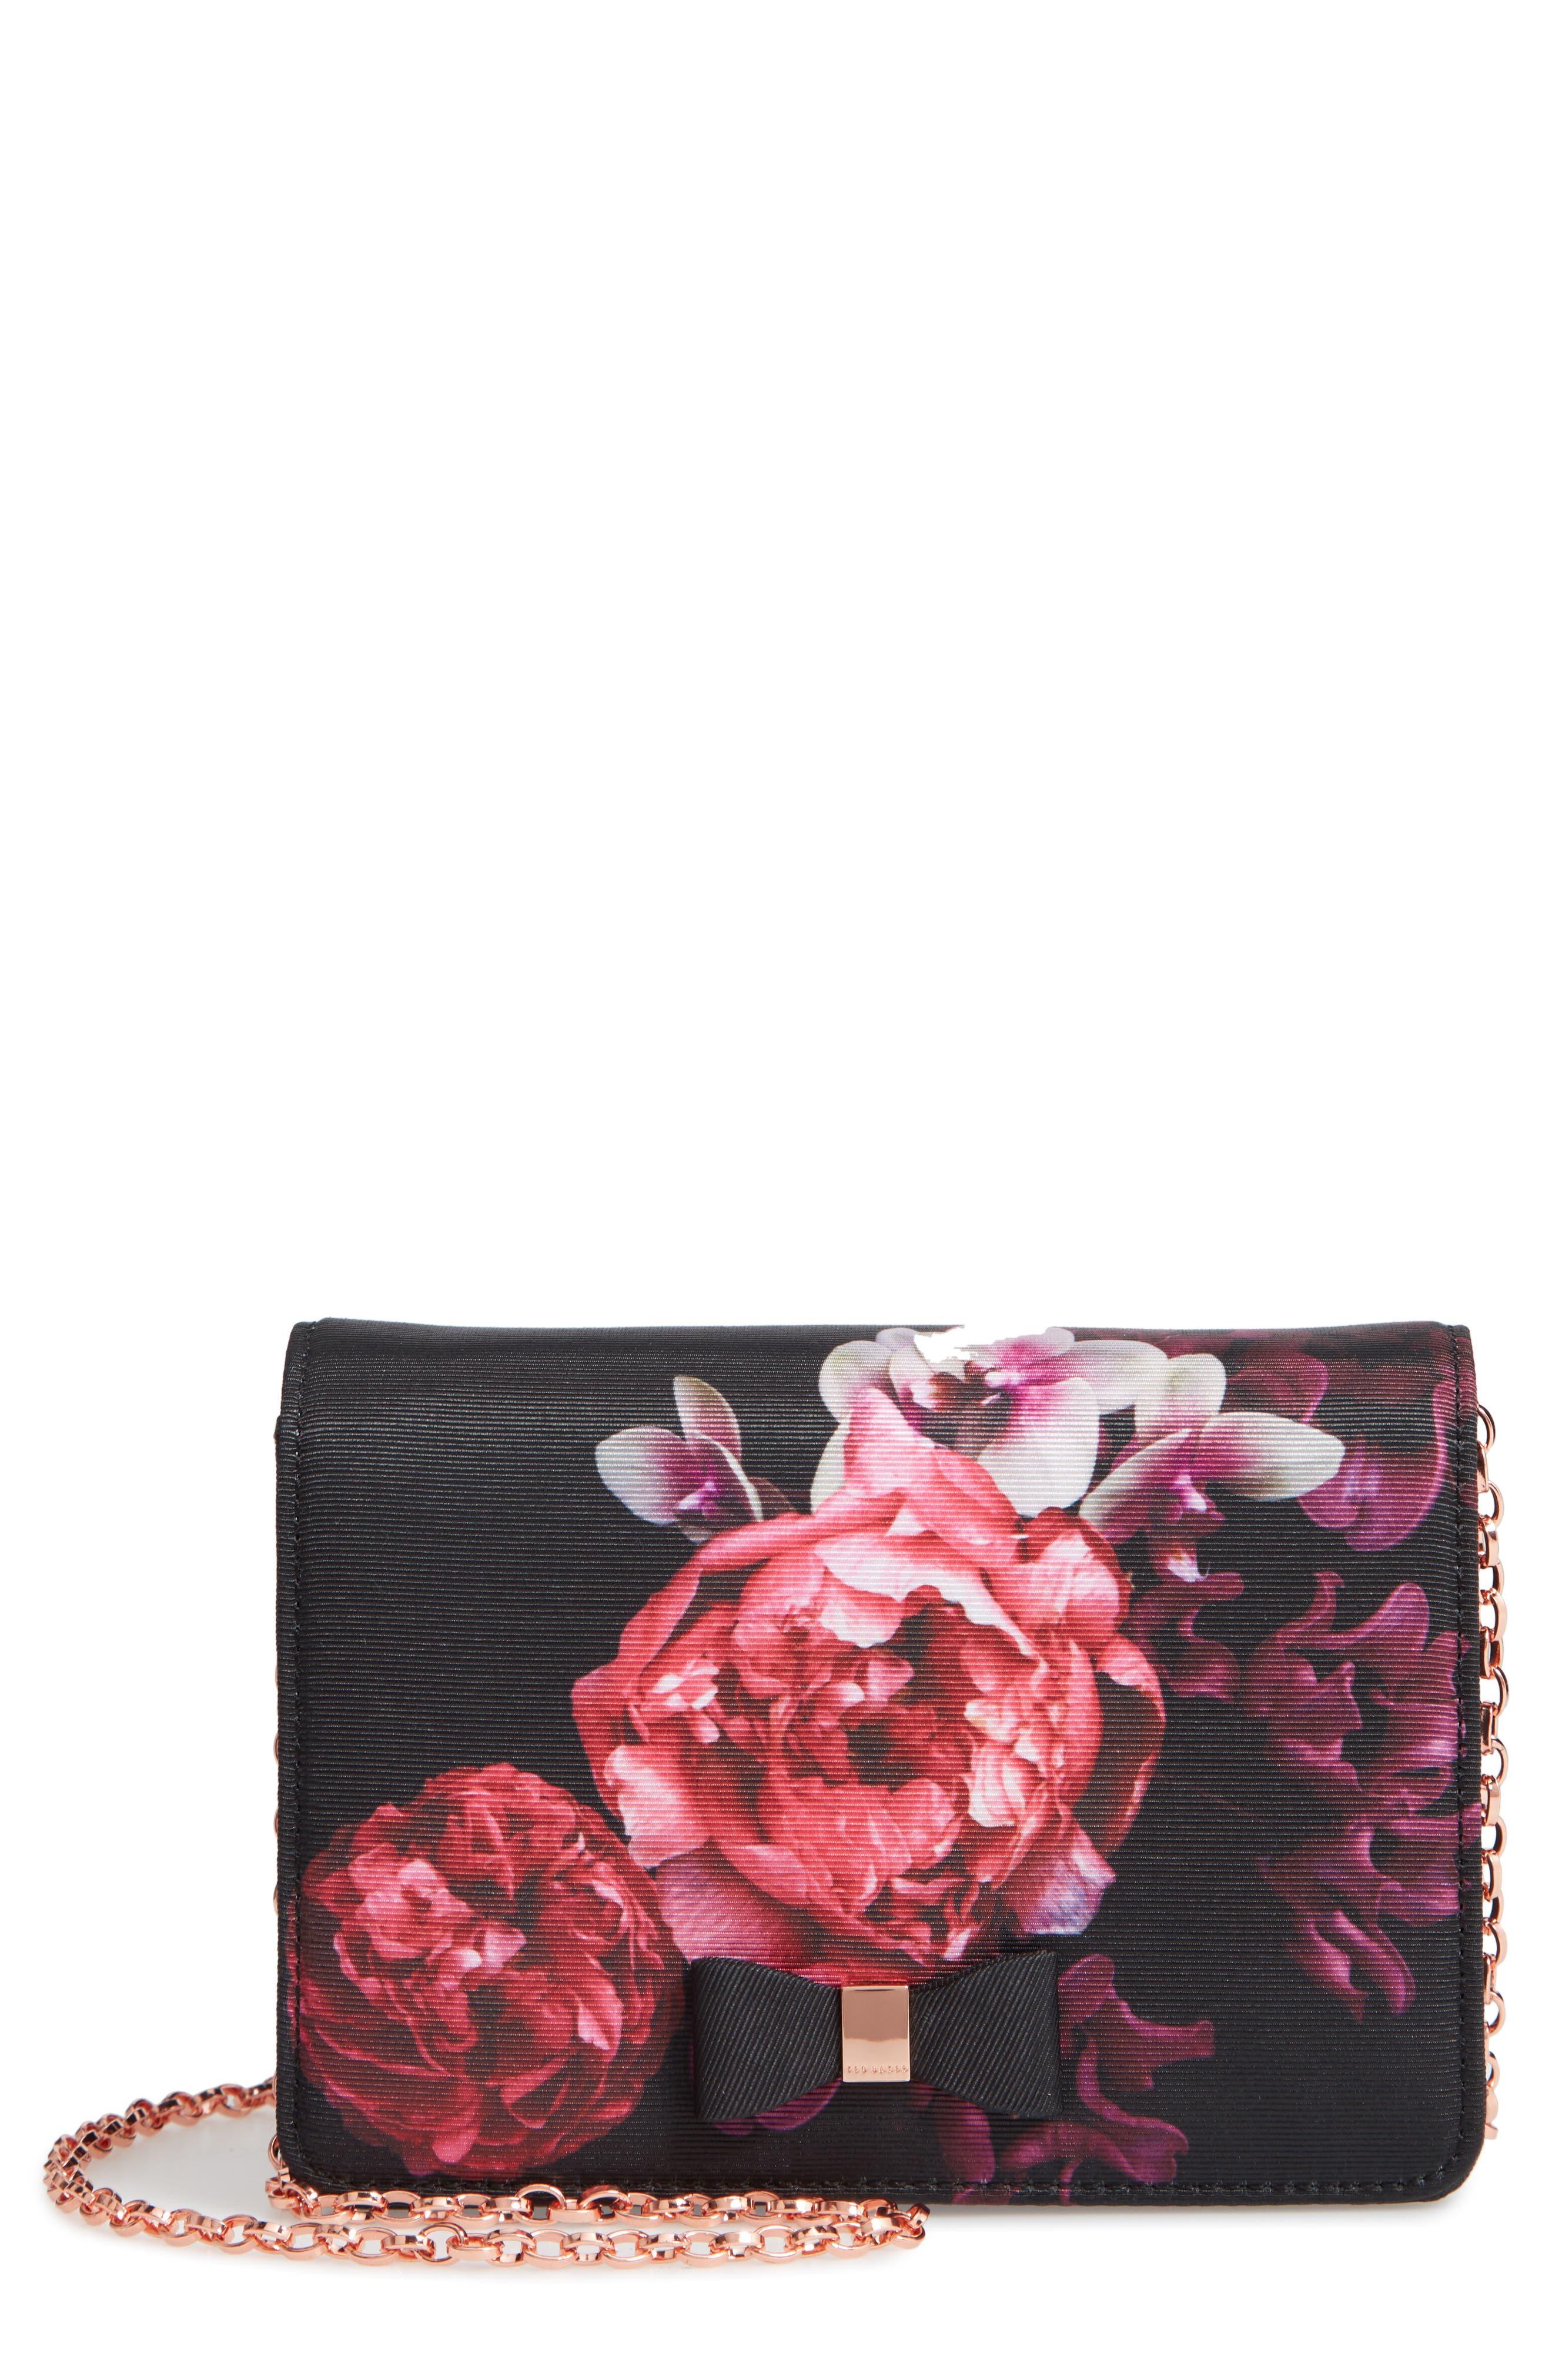 Splendour Mini Bow Evening Bag,                         Main,                         color, 001